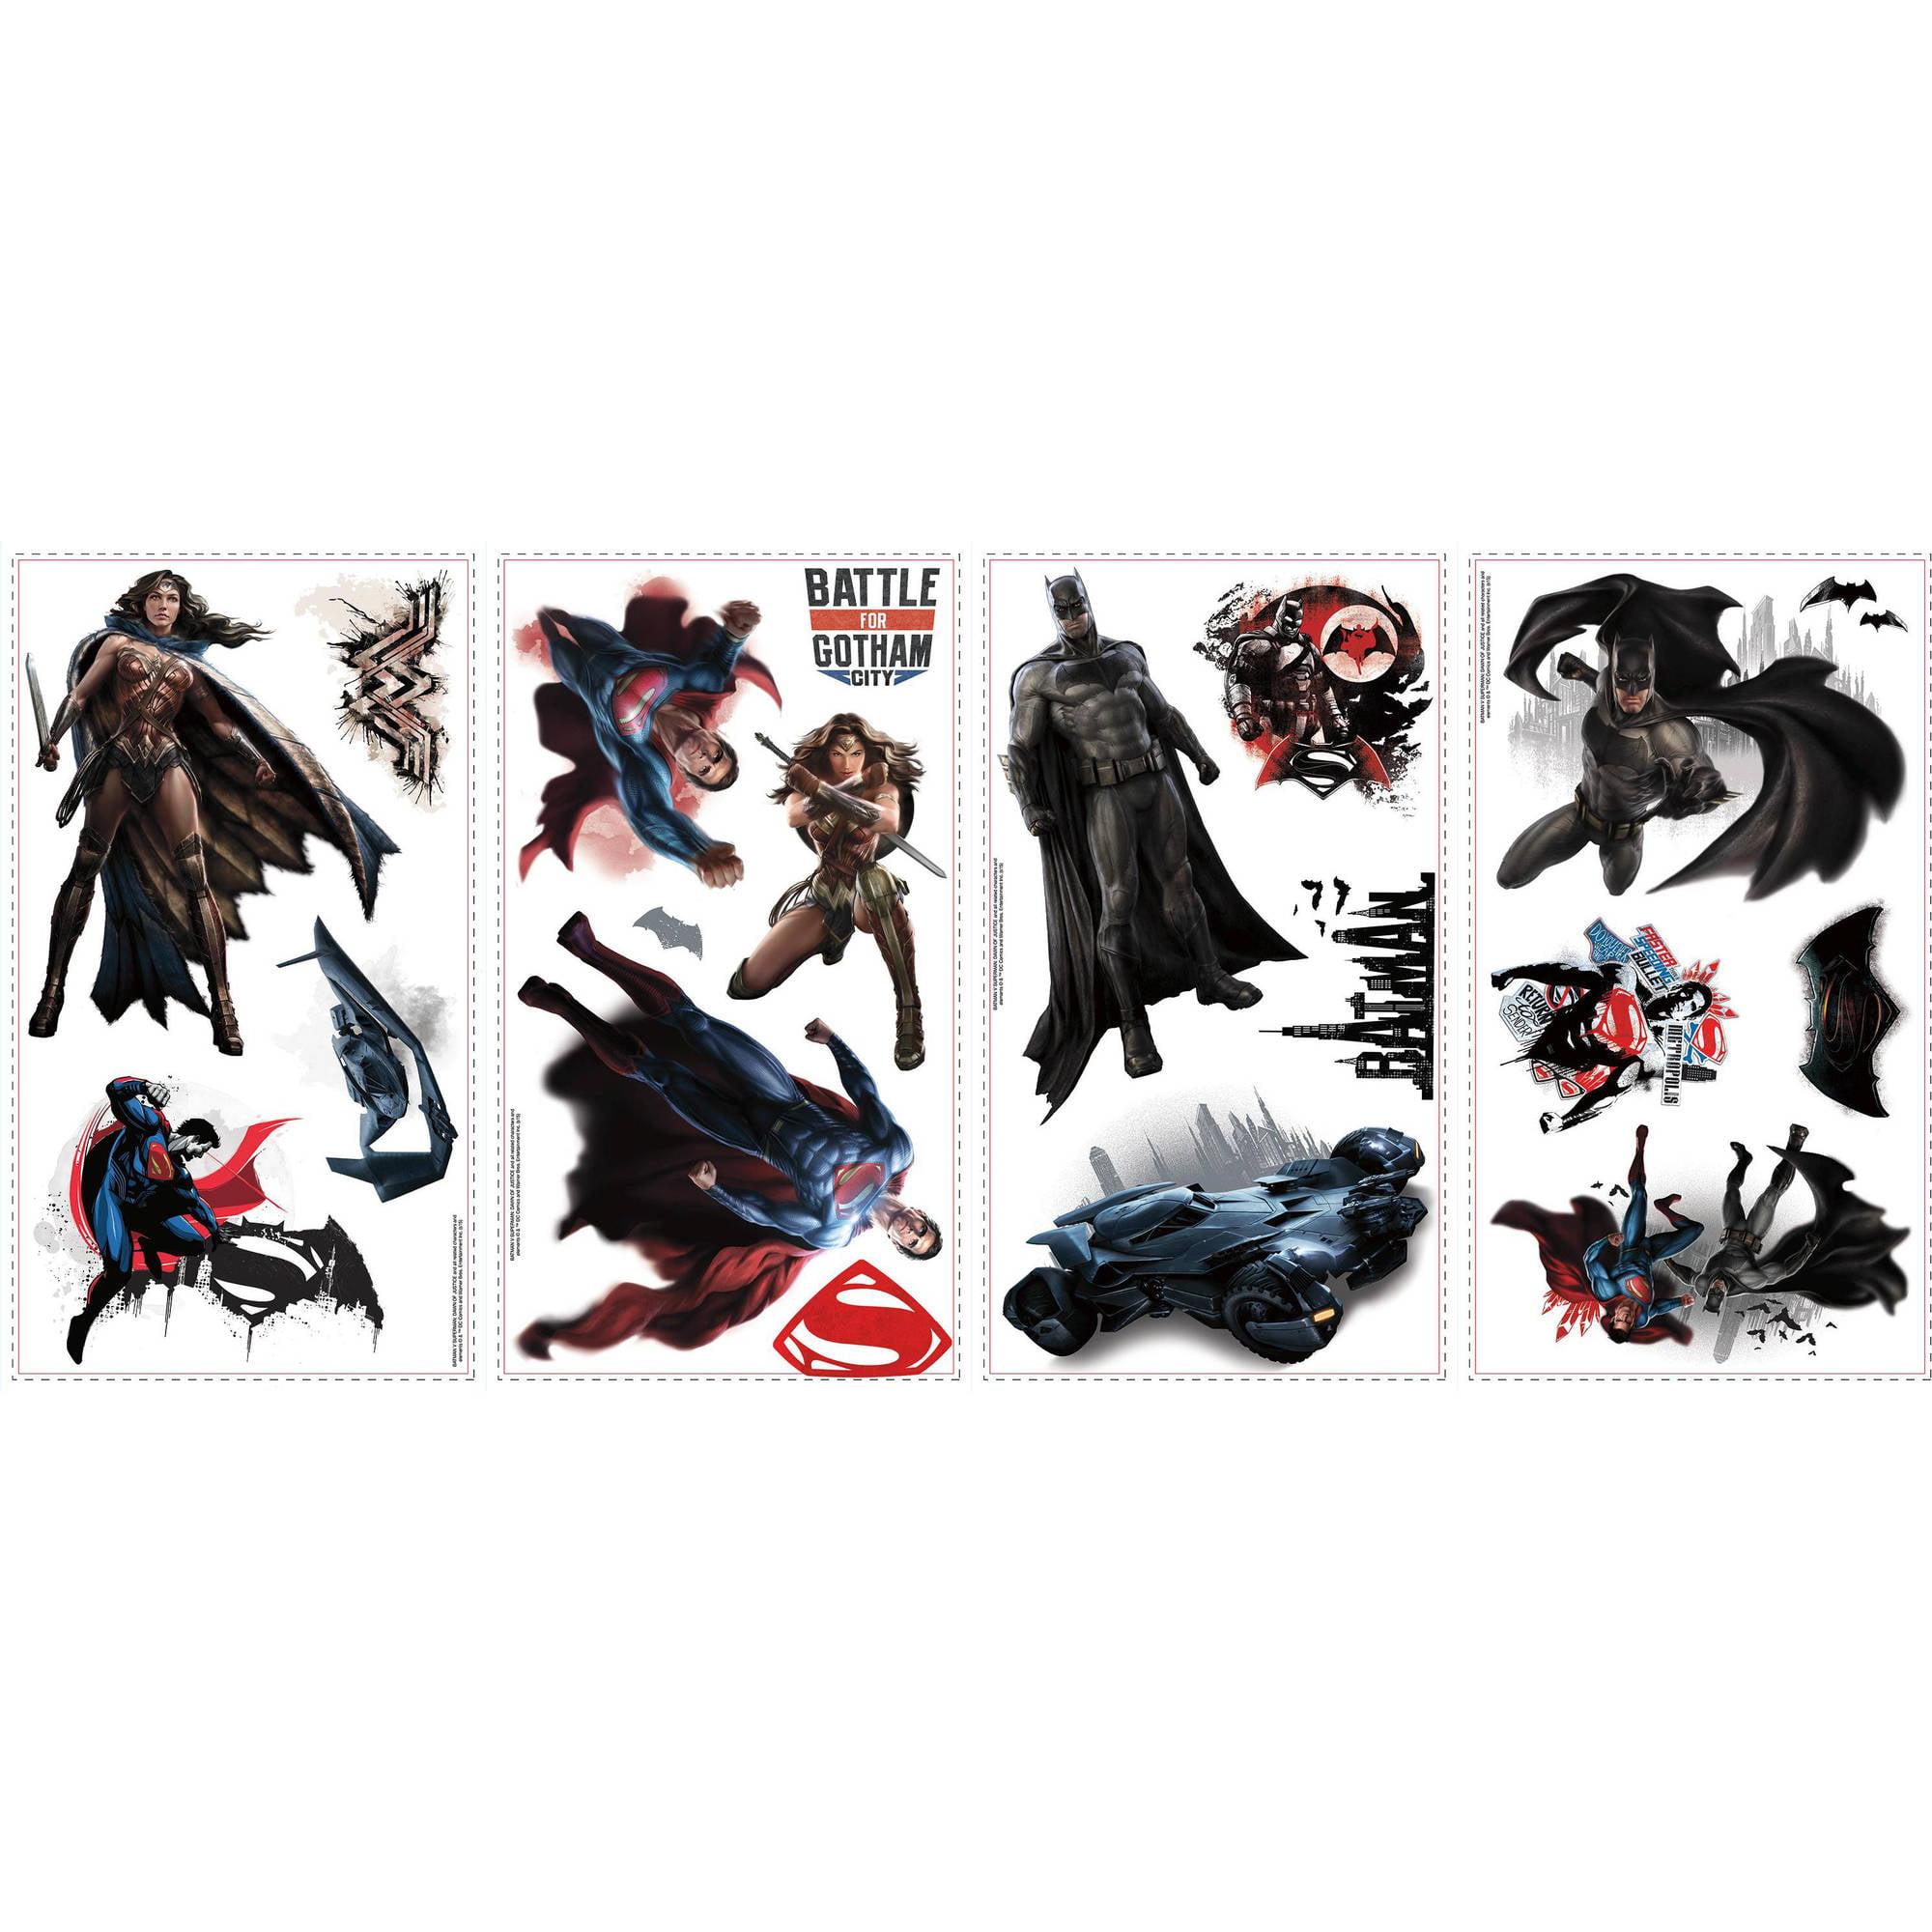 Roommates batman vs superman peel and stick wall decals walmart amipublicfo Choice Image